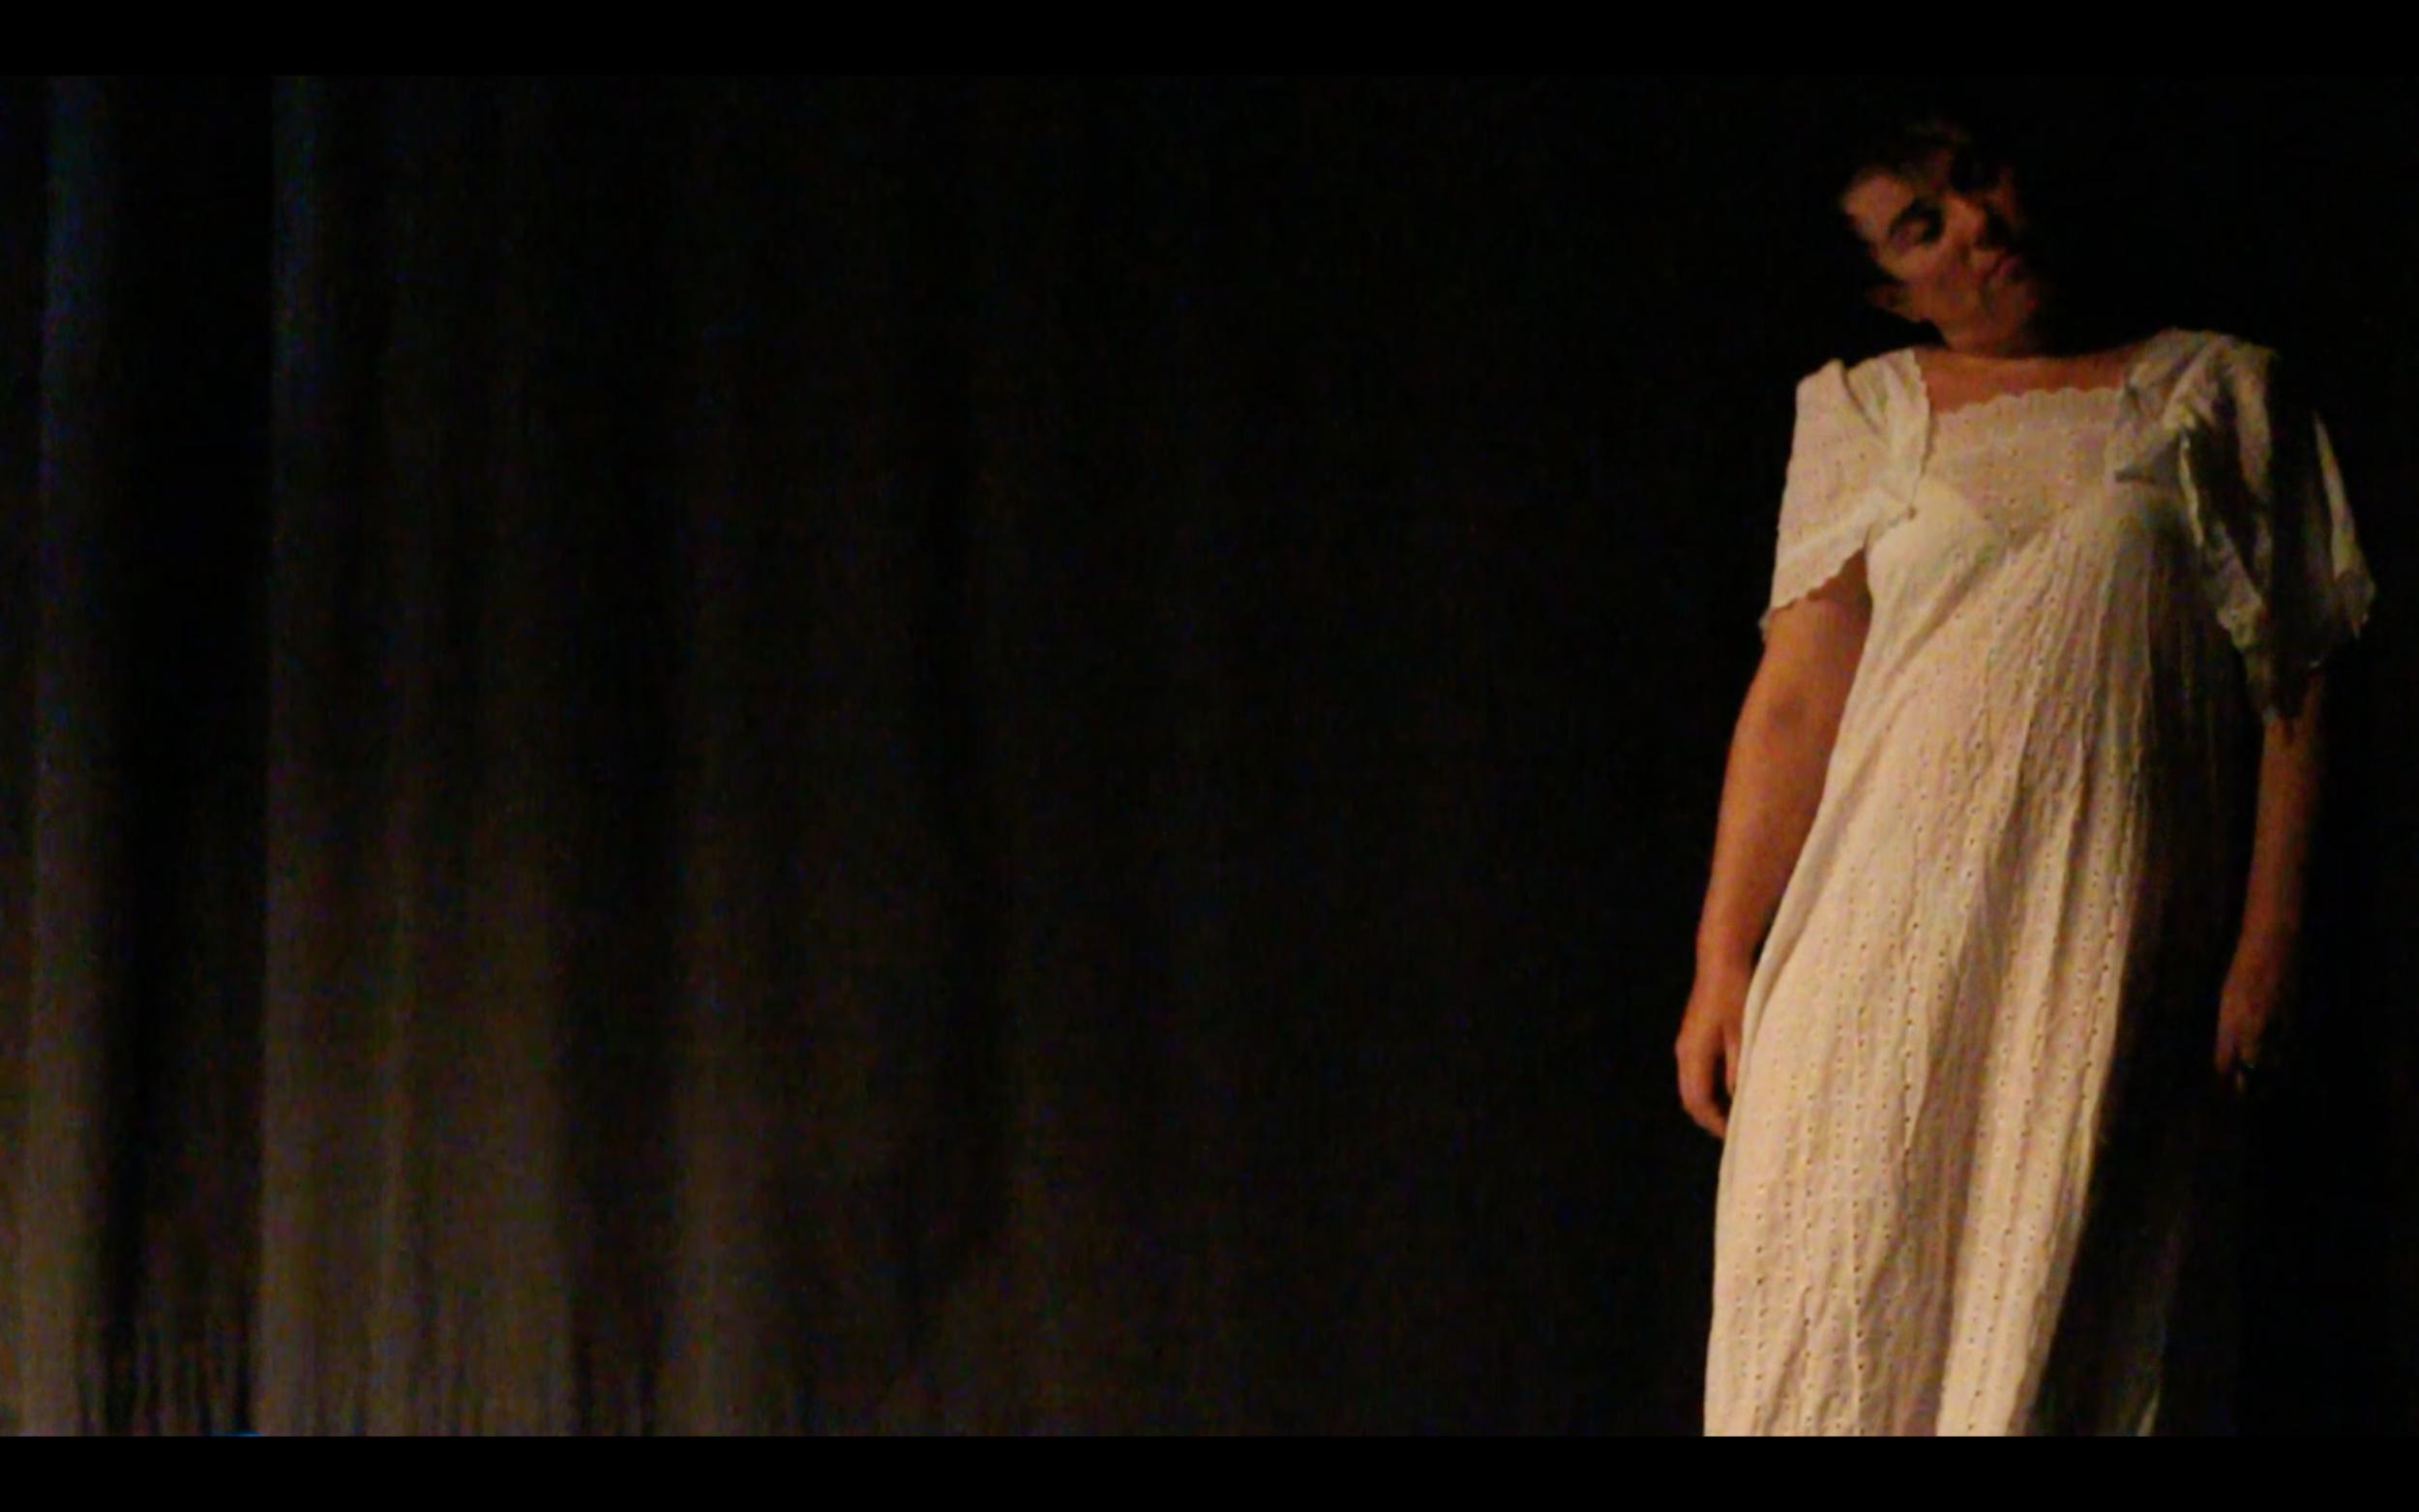 Copy of 'Embodying Space' Veronica Fazzio